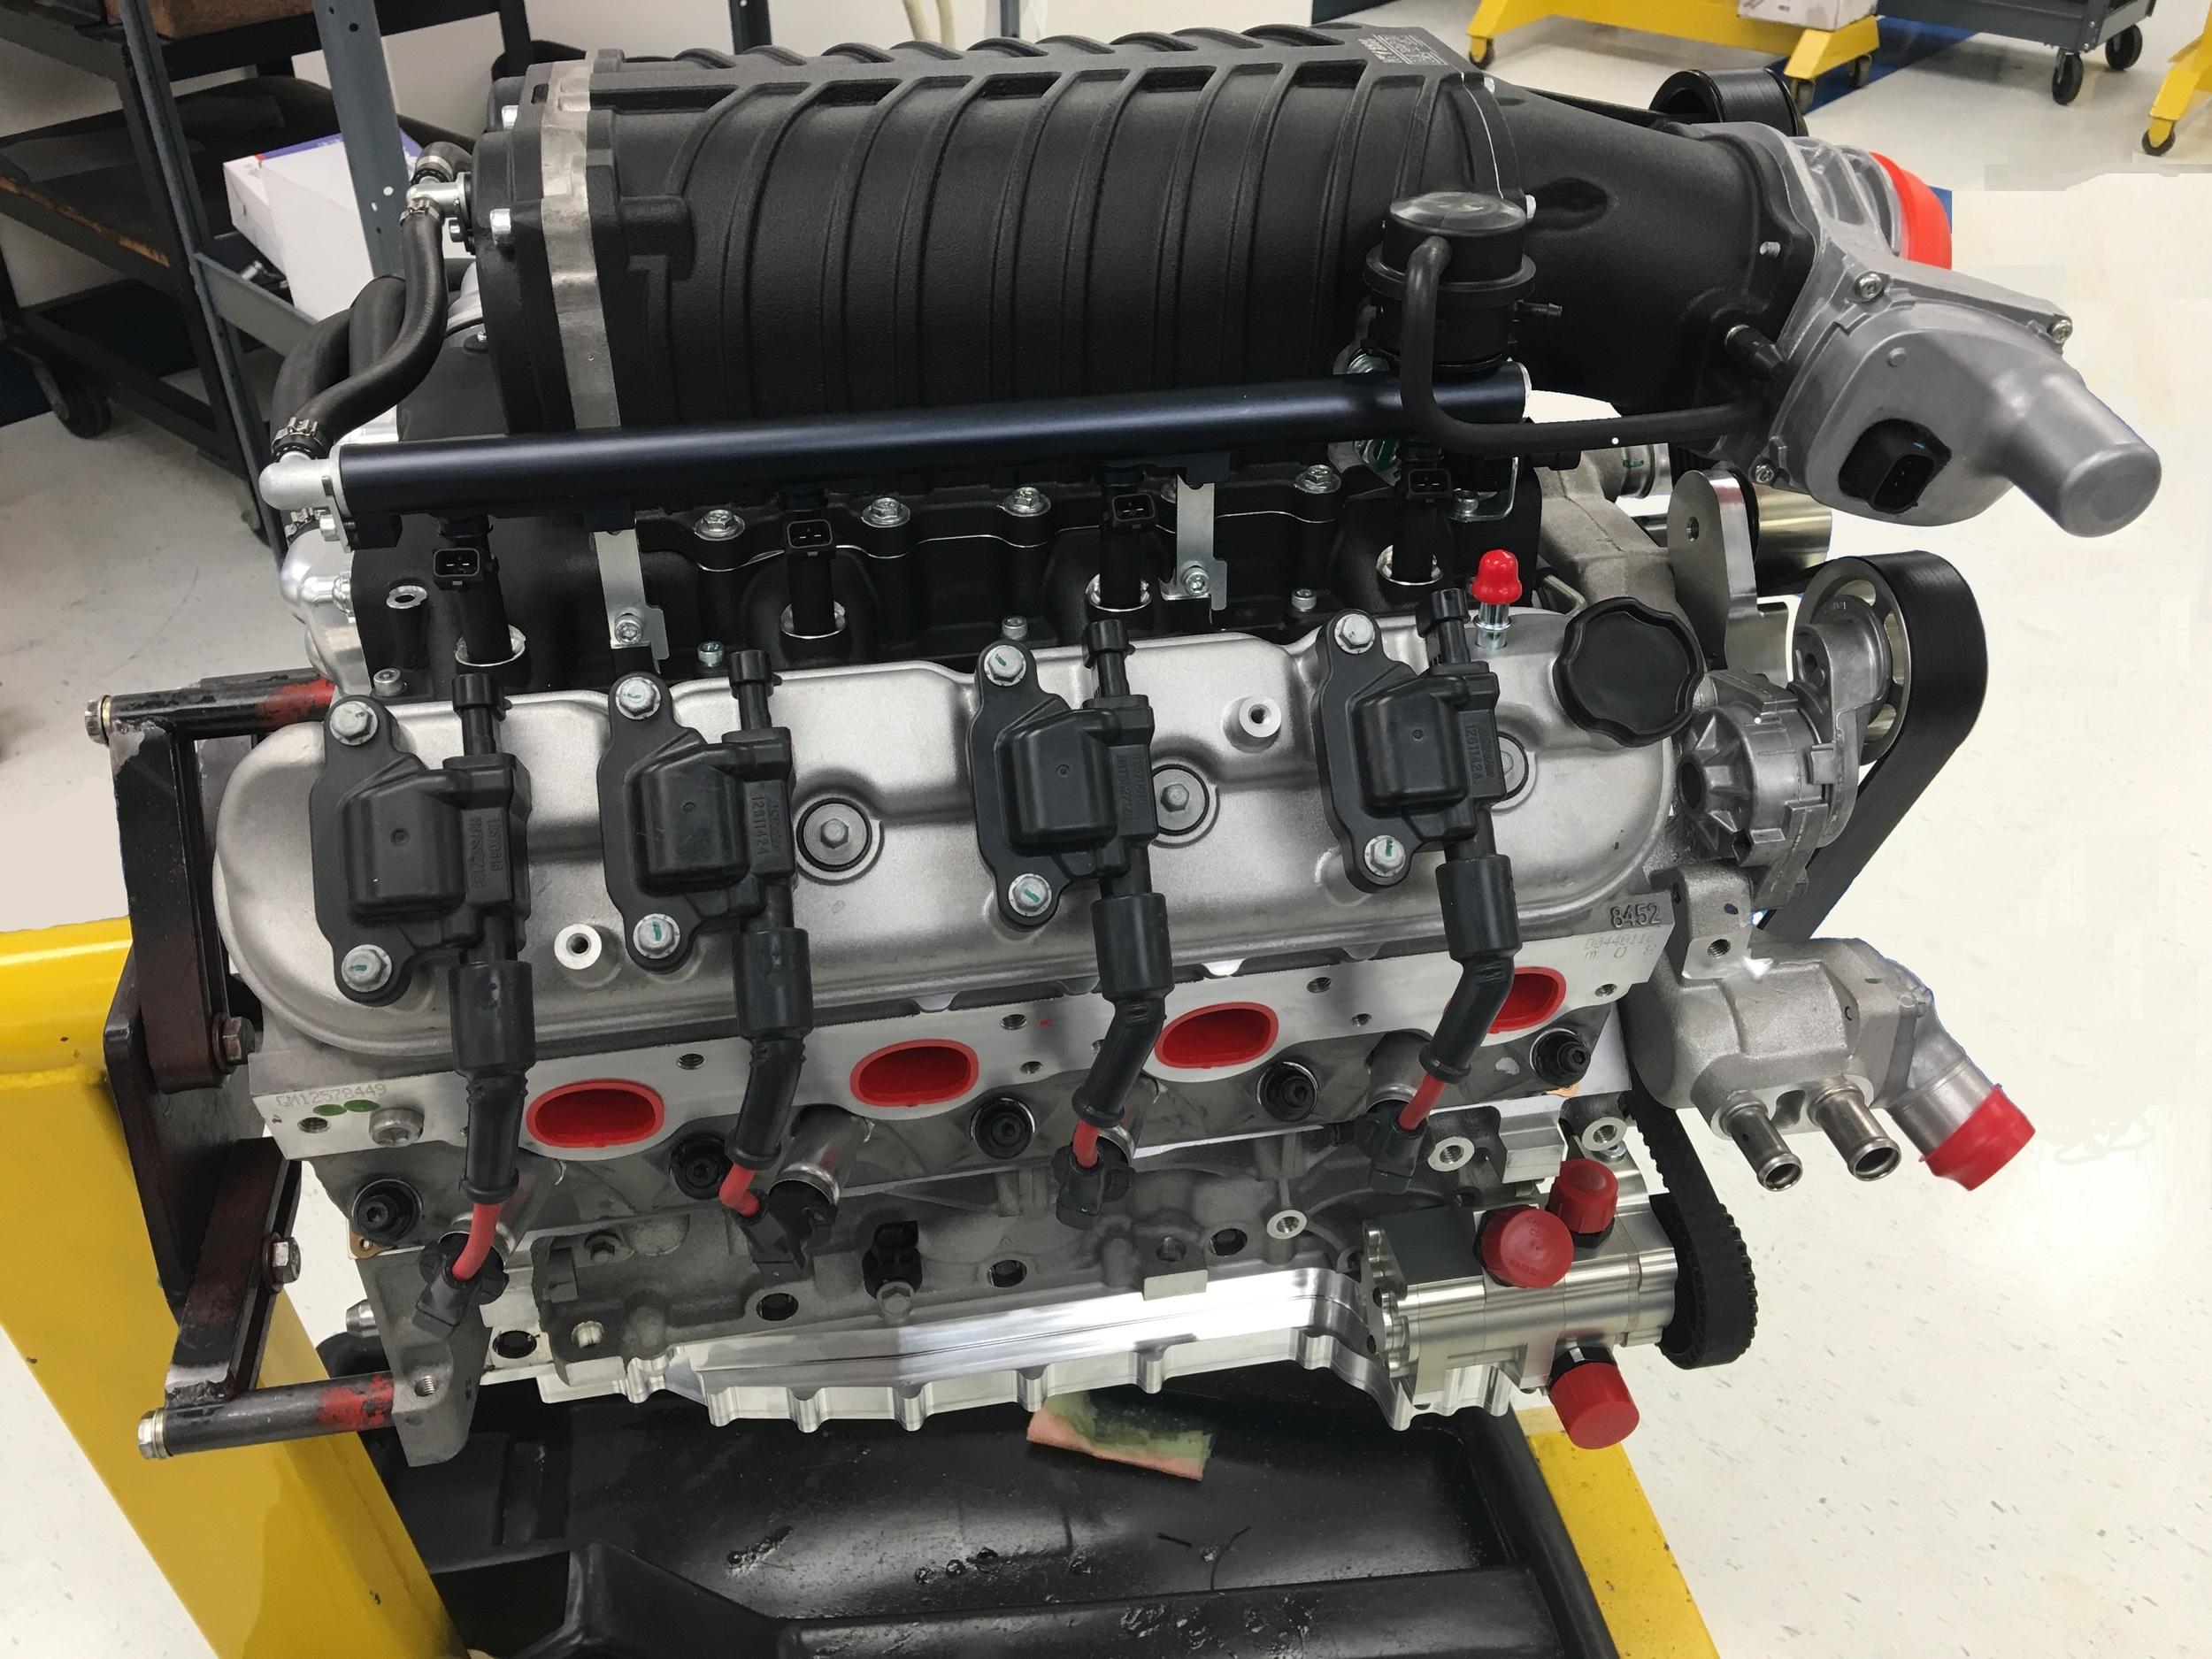 Engine_01.jpg